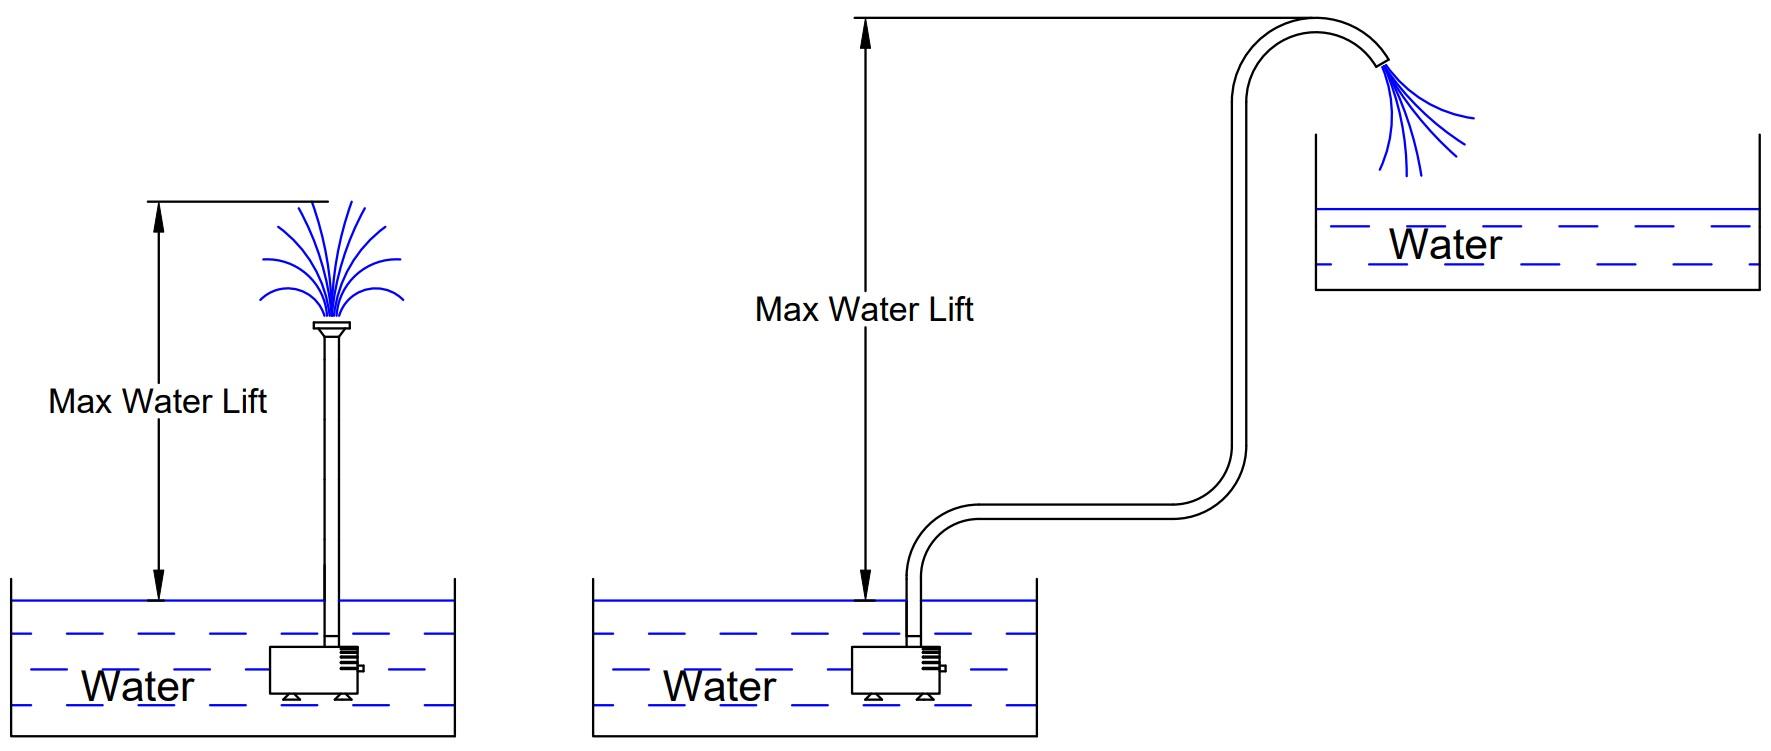 Max Water Lift